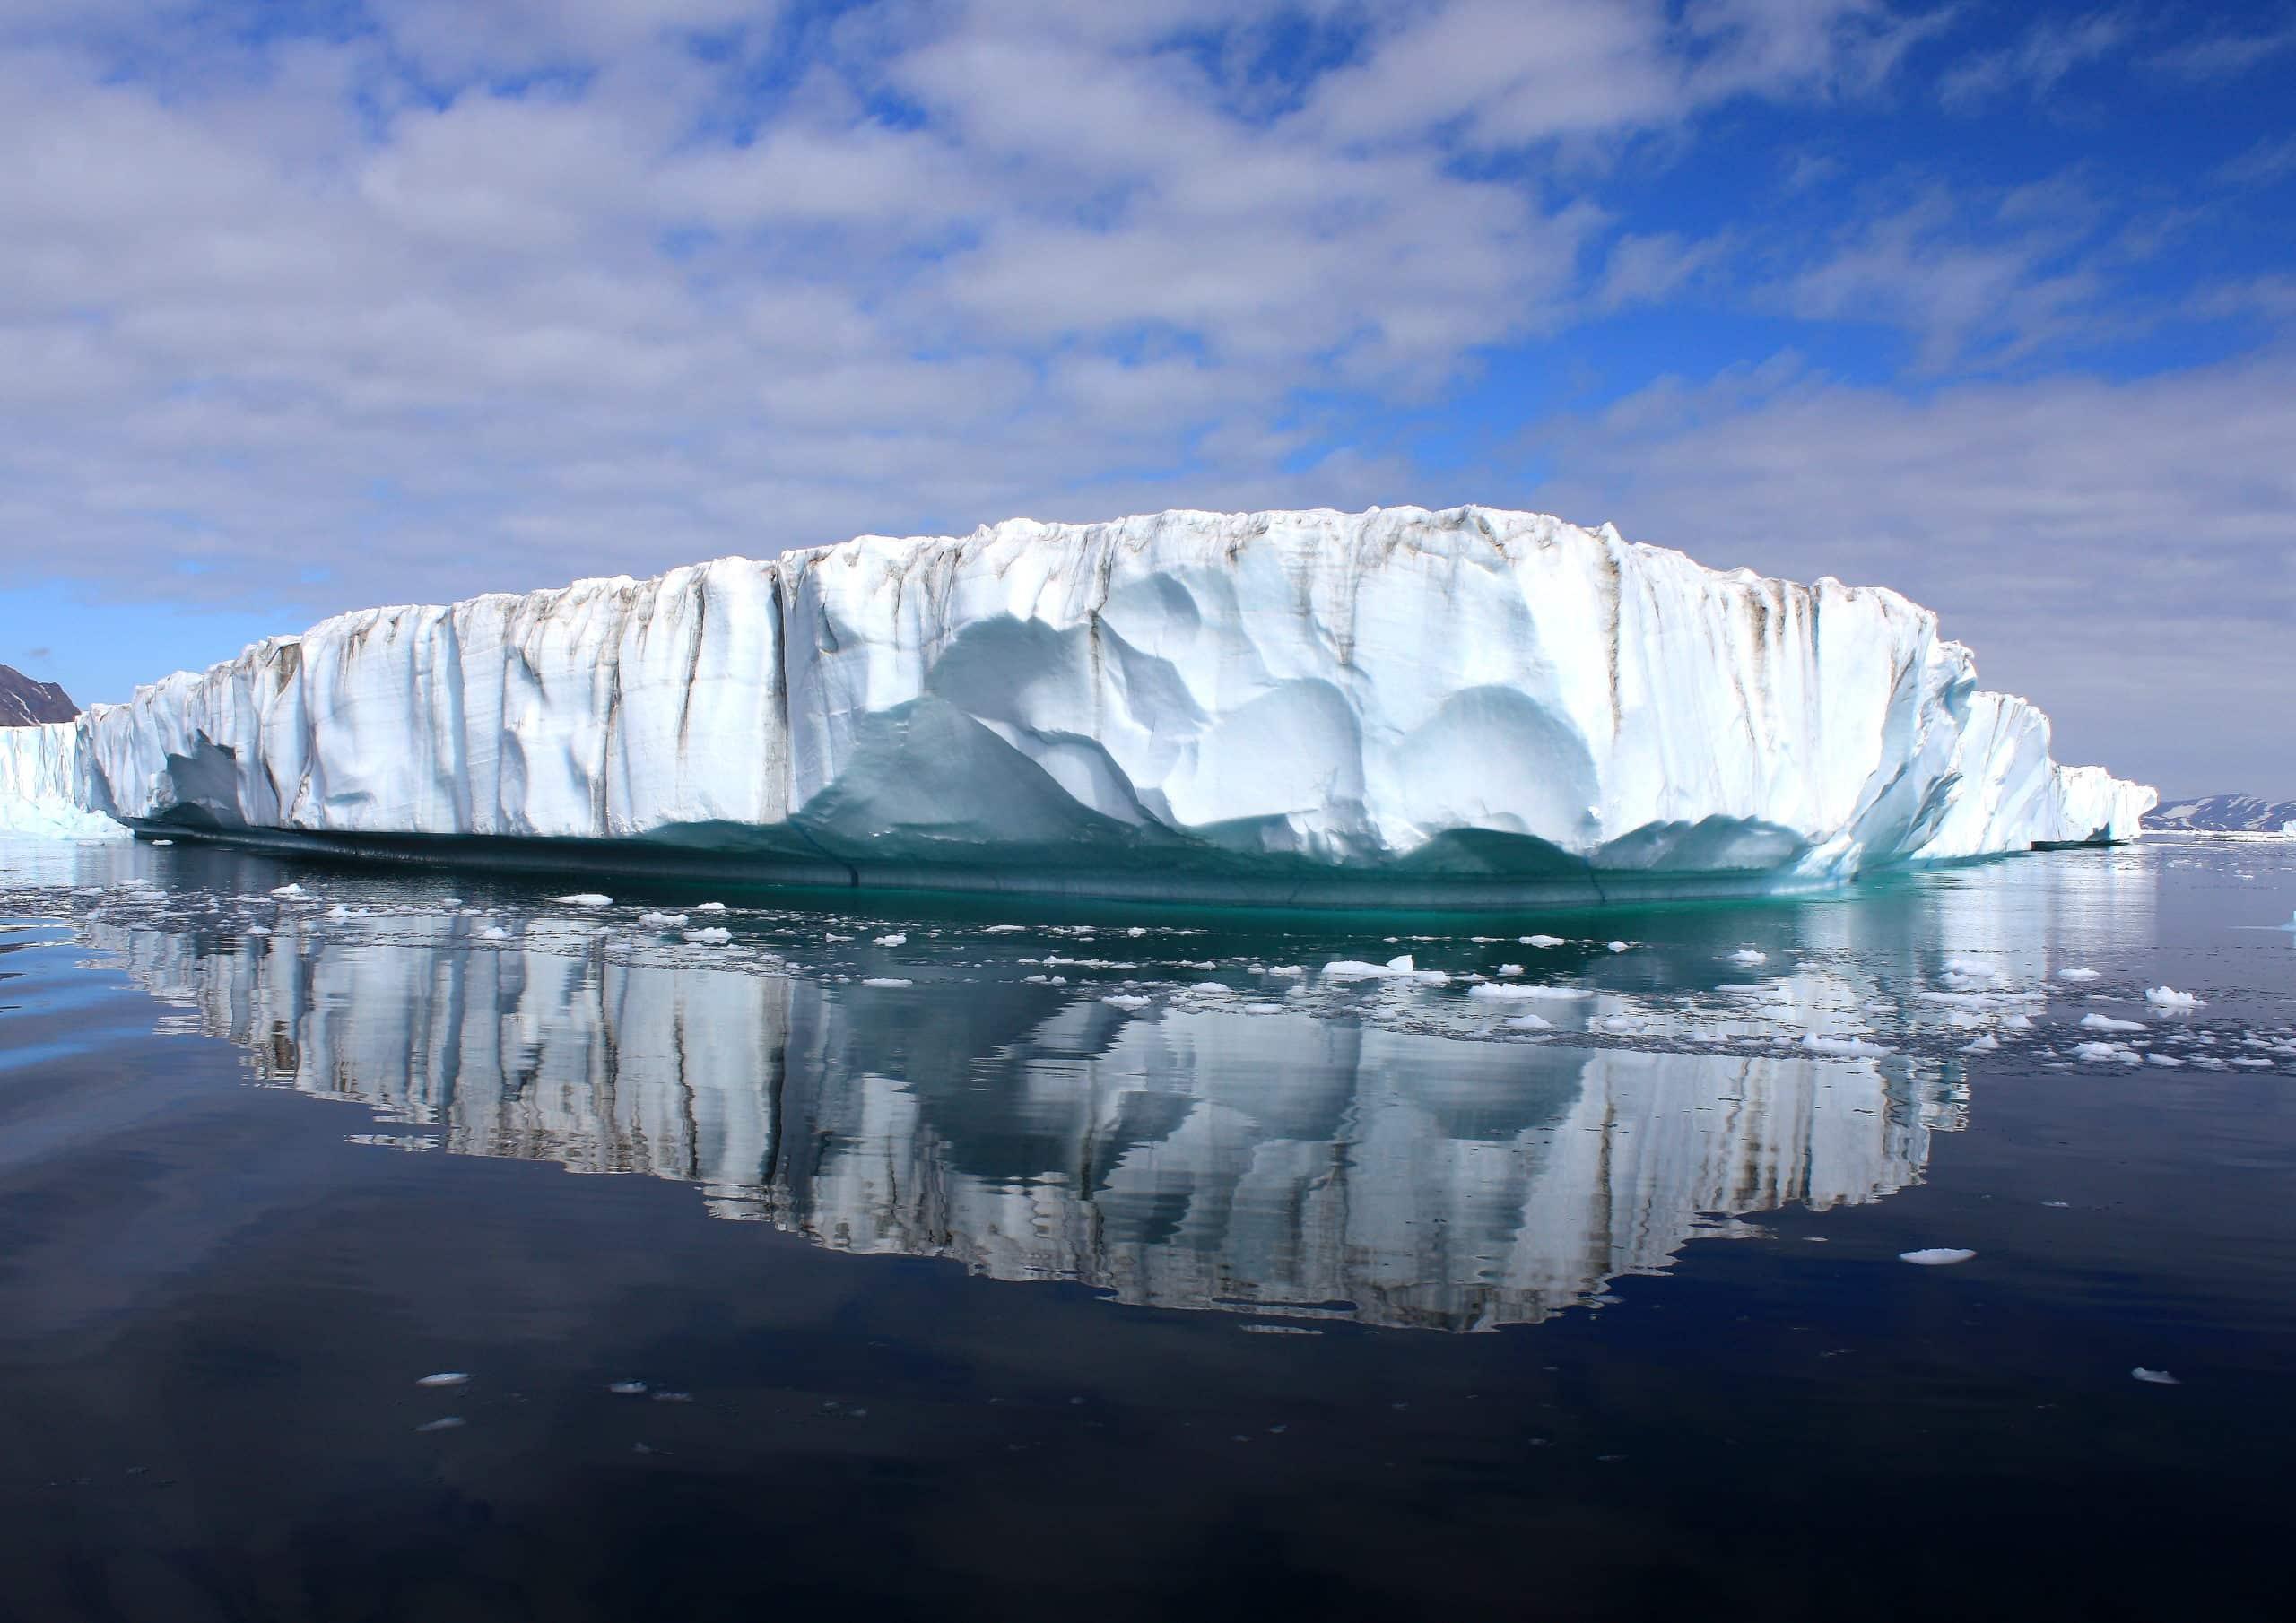 Melting ice has raised global sea levels